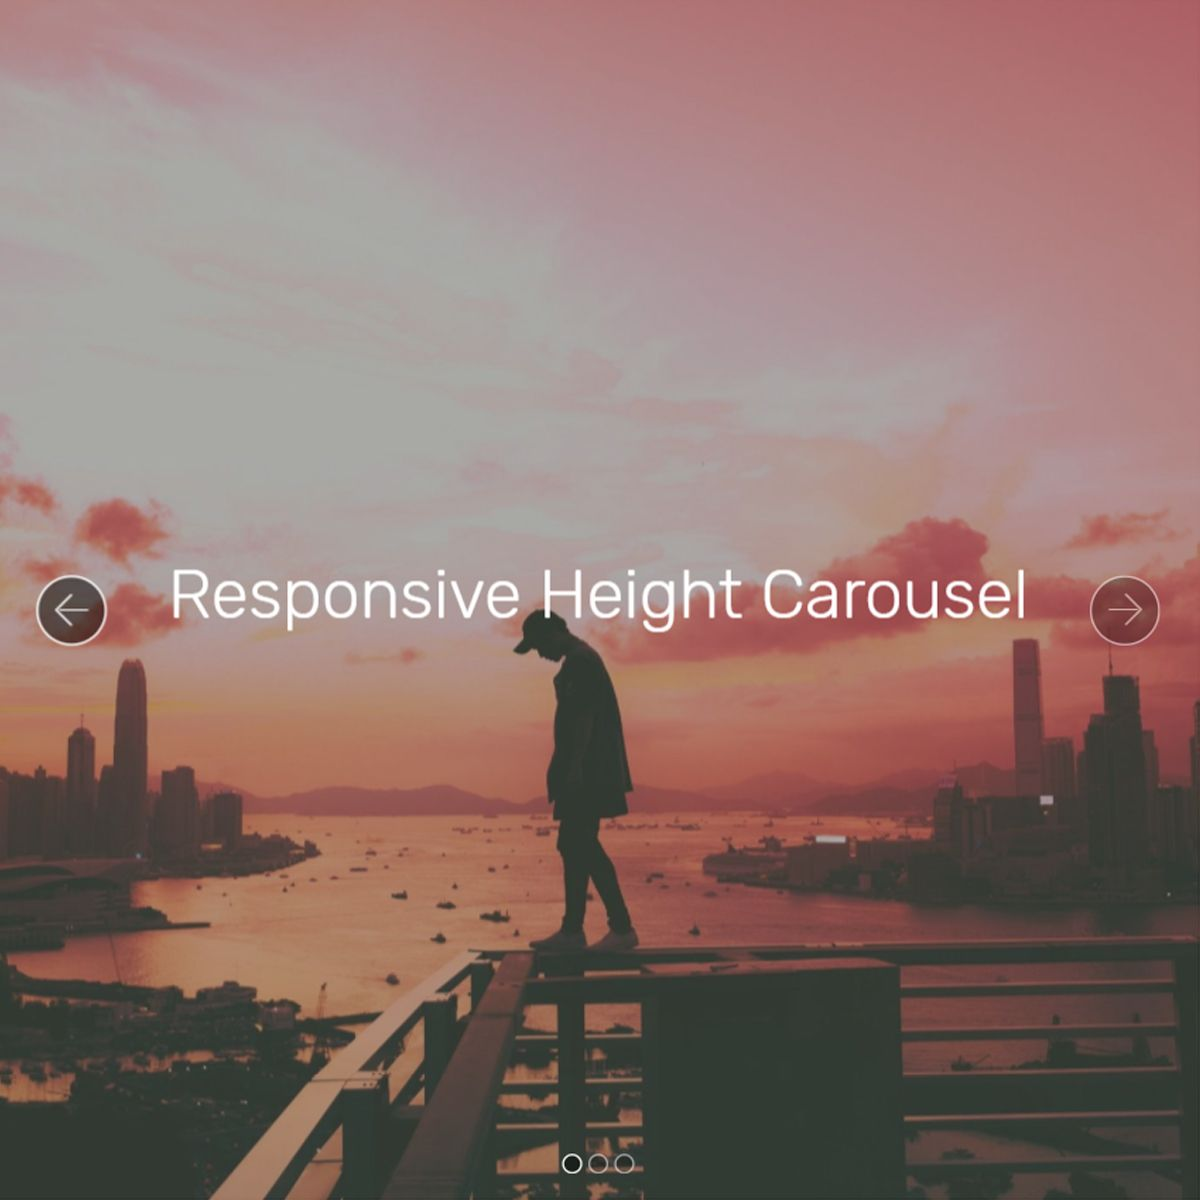 HTML Bootstrap Image Slideshow